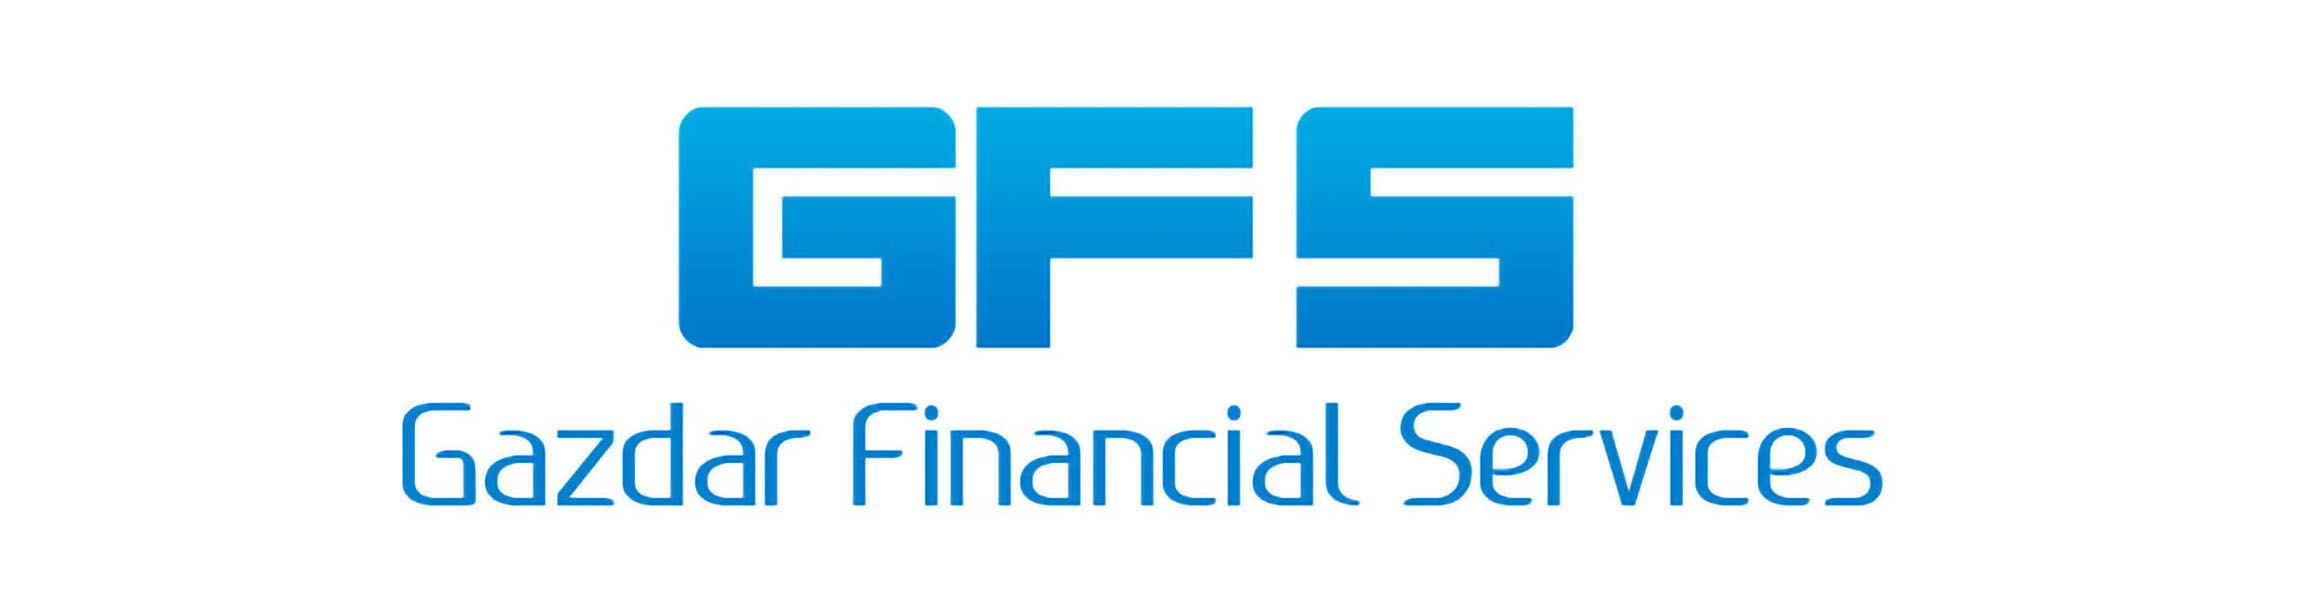 Gazdar Financial Services